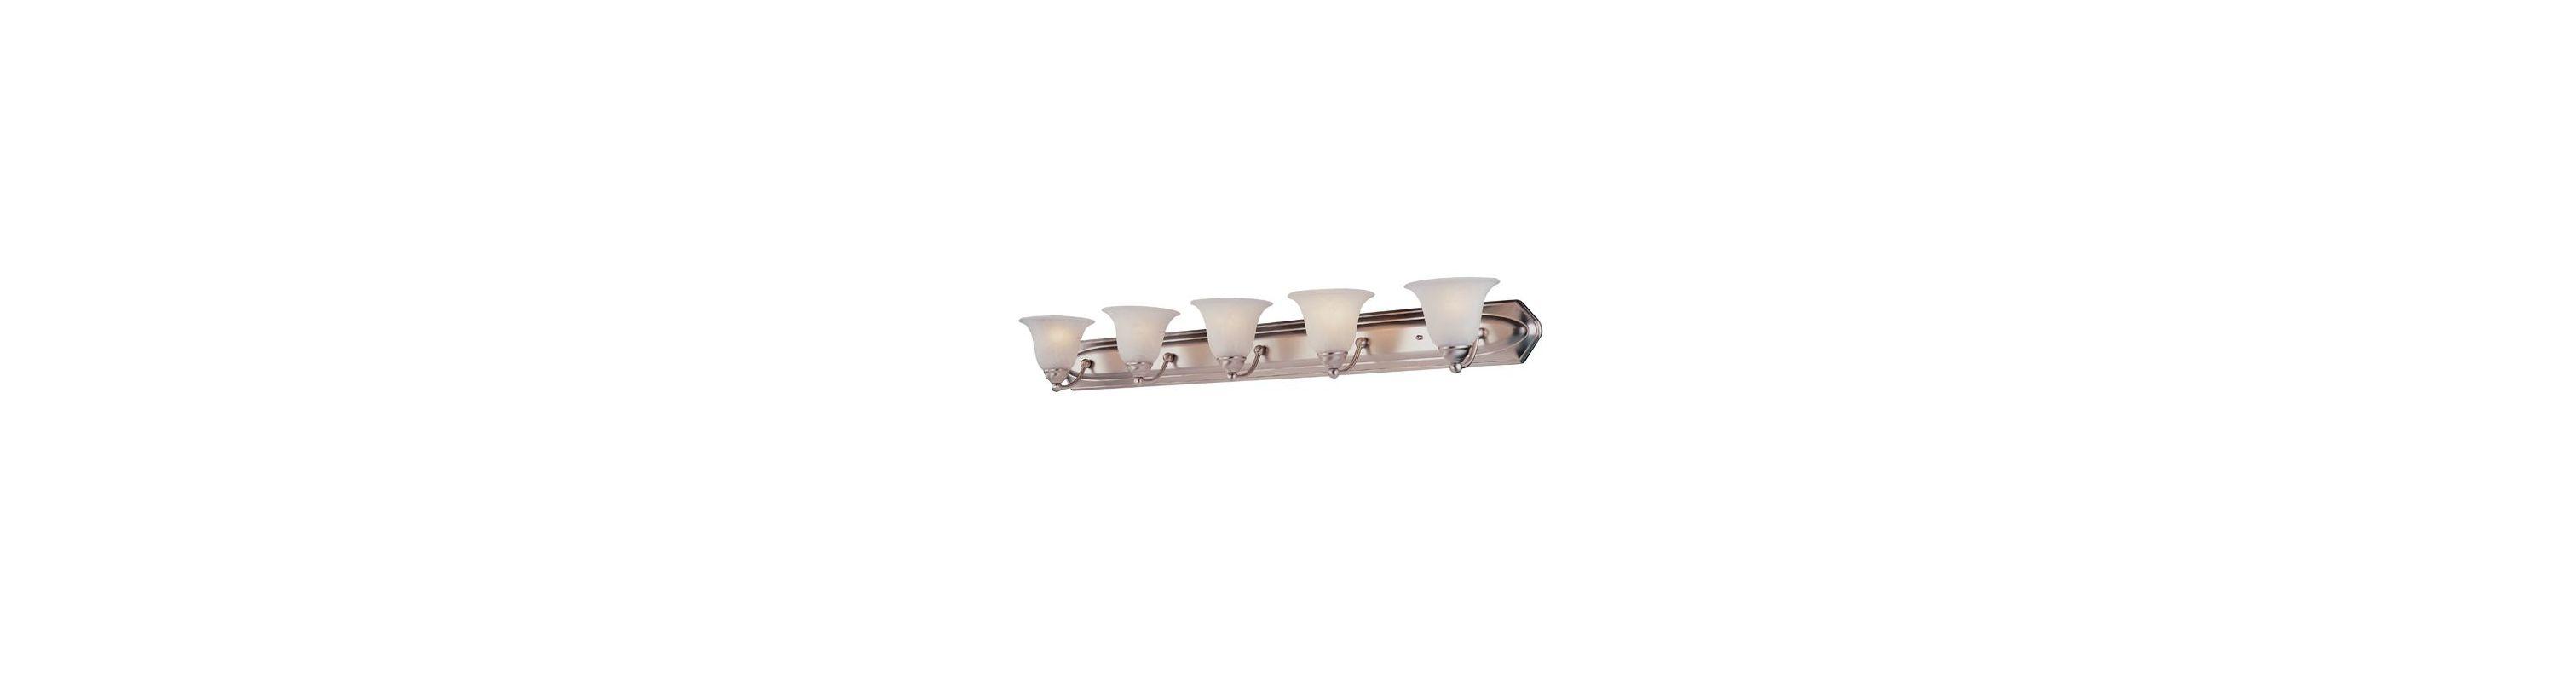 DVI Lighting DVP42405 Diamond 5 Light Incandescent Bathroom Vanity Sale $233.70 ITEM: bci1371535 ID#:DVP42405SN UPC: 61467425577 :